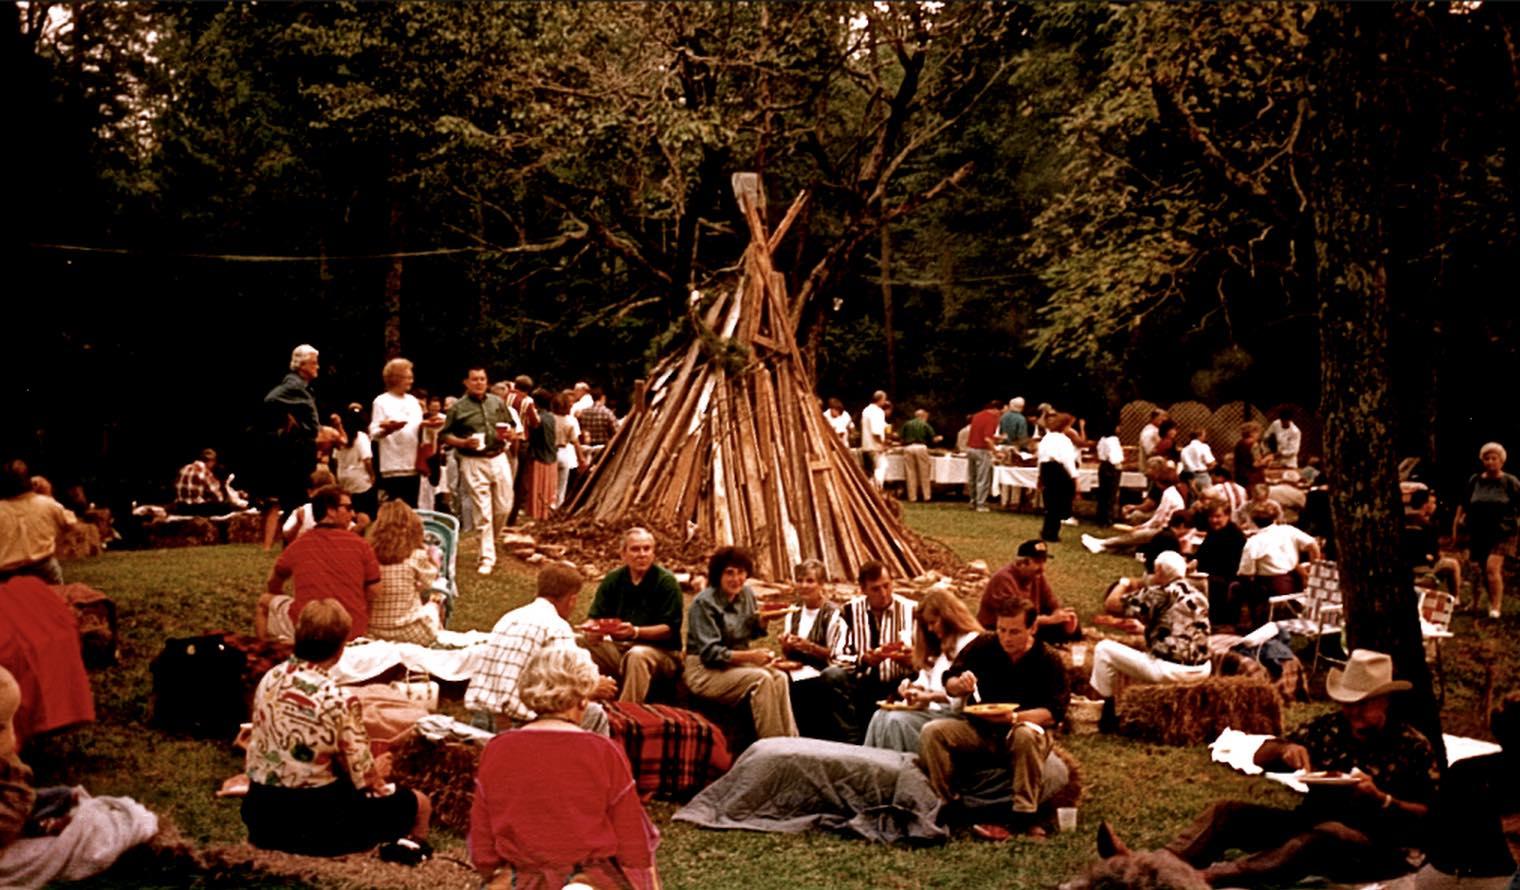 Vintage Bonfire Shot